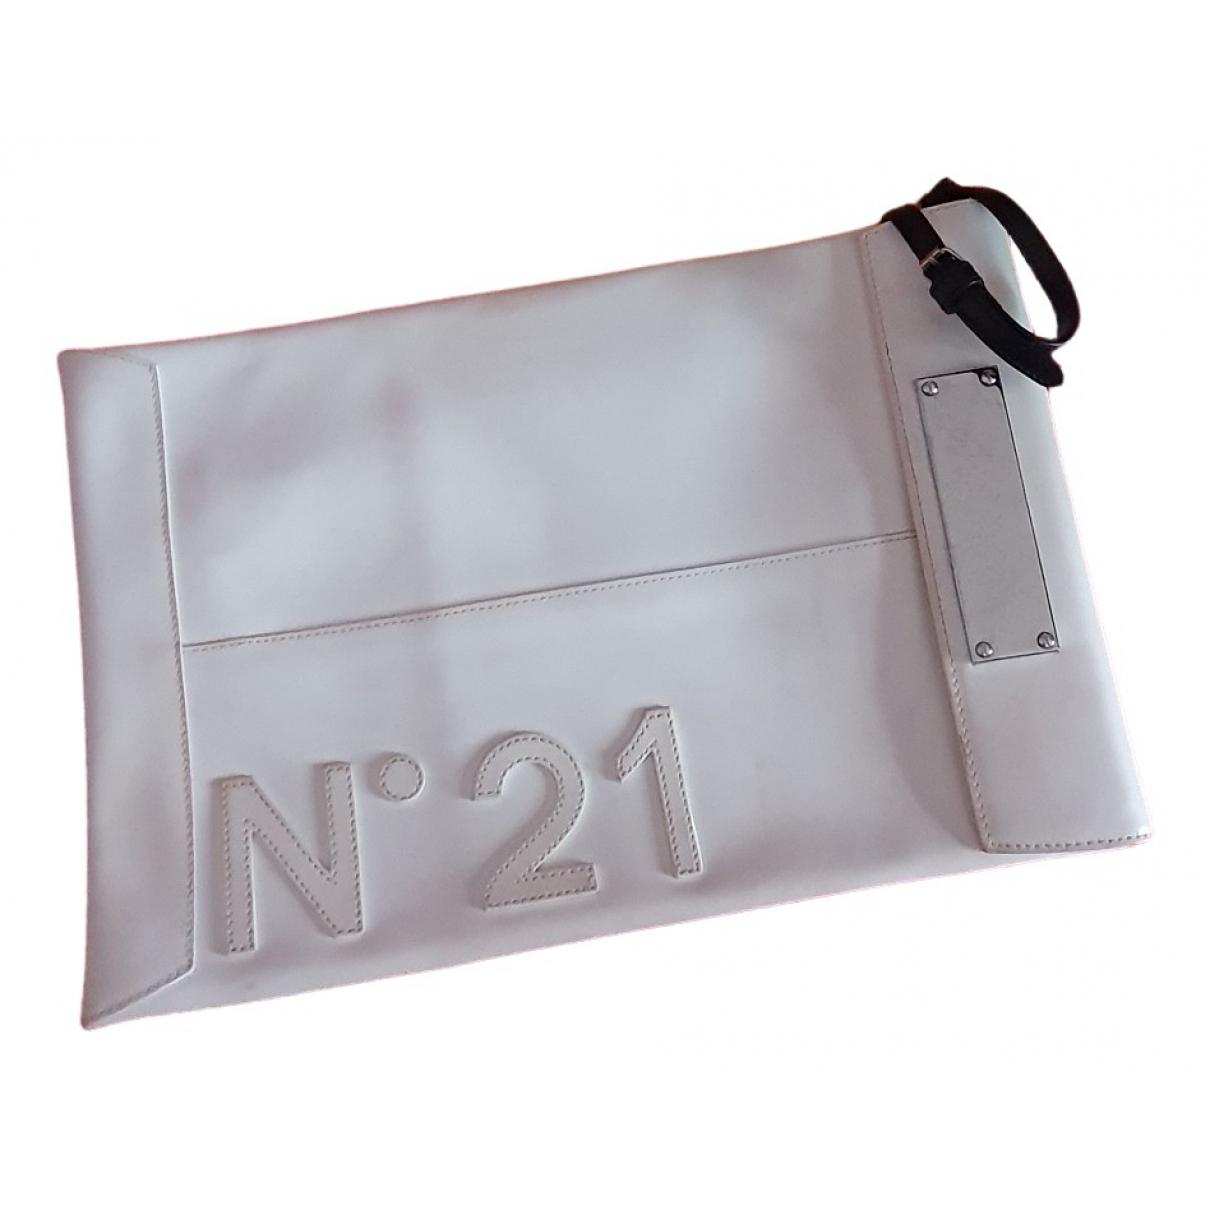 N°21 \N Clutch in  Weiss Leder